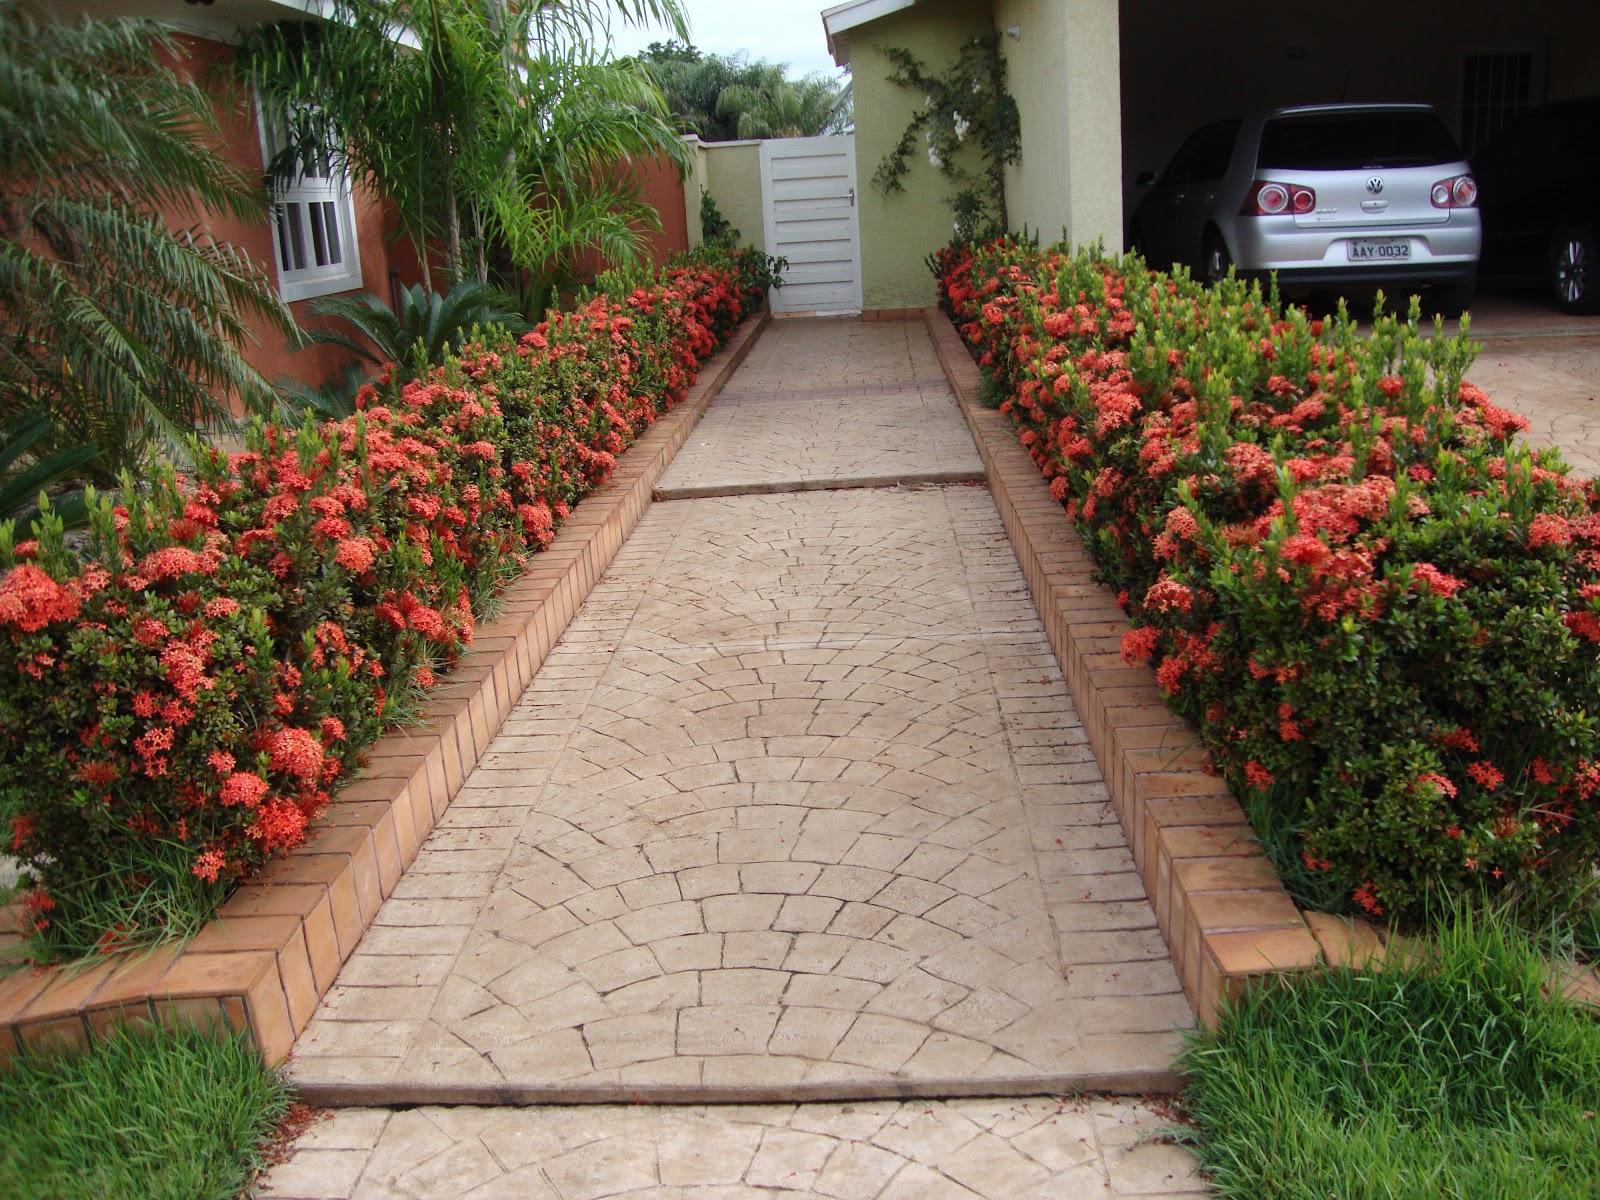 ideias jardins moradias : ideias jardins moradias:casas bonitas: caminhos de entrada de casa